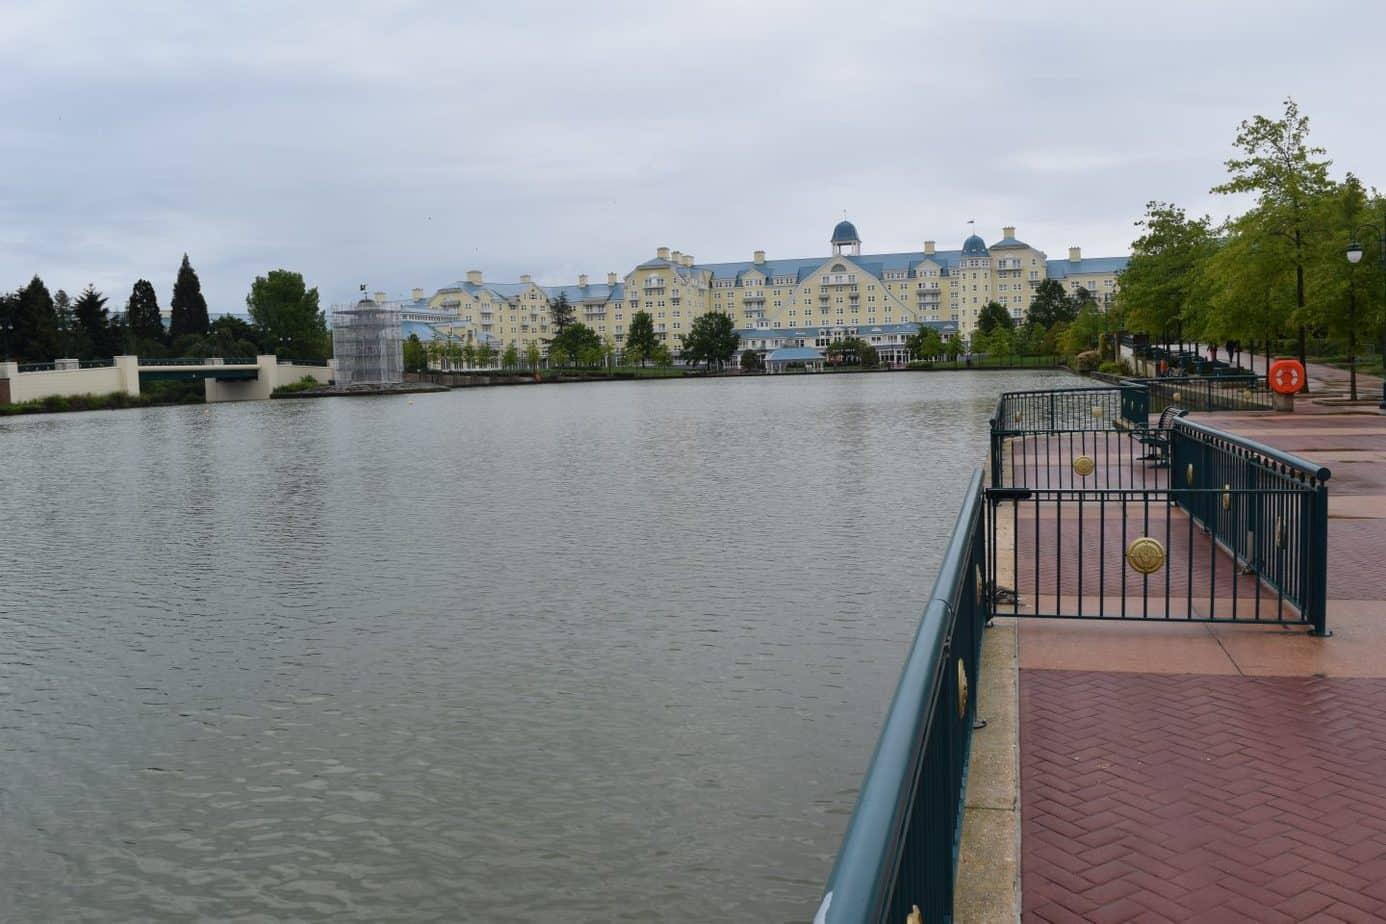 Disneyland Paris Newport Bay hotel exterior overlooking the lake